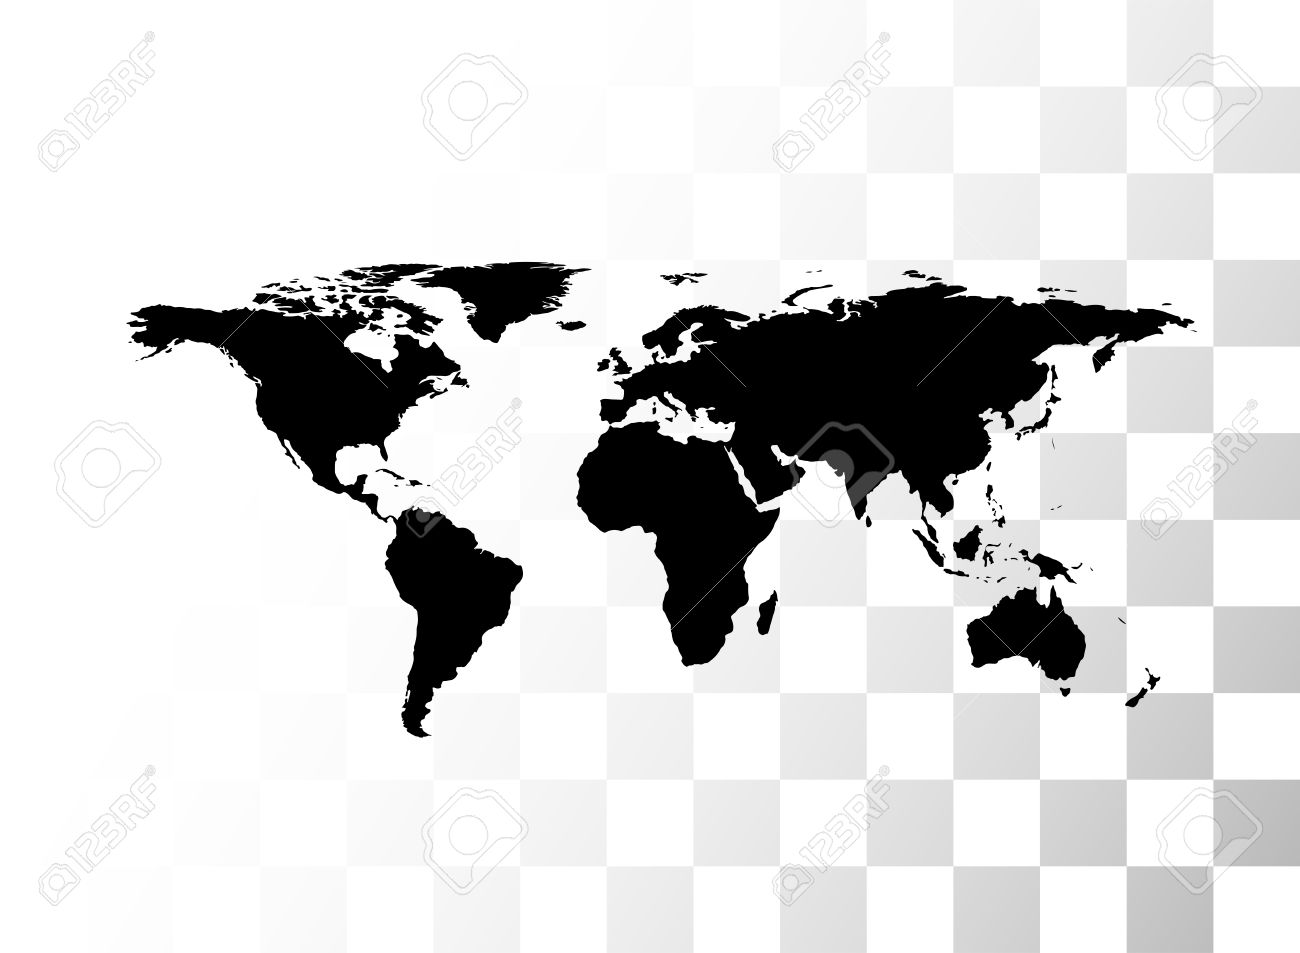 Vector Mondo Nero Mappa, Con Sfondo Trasparente Clipart Royalty.